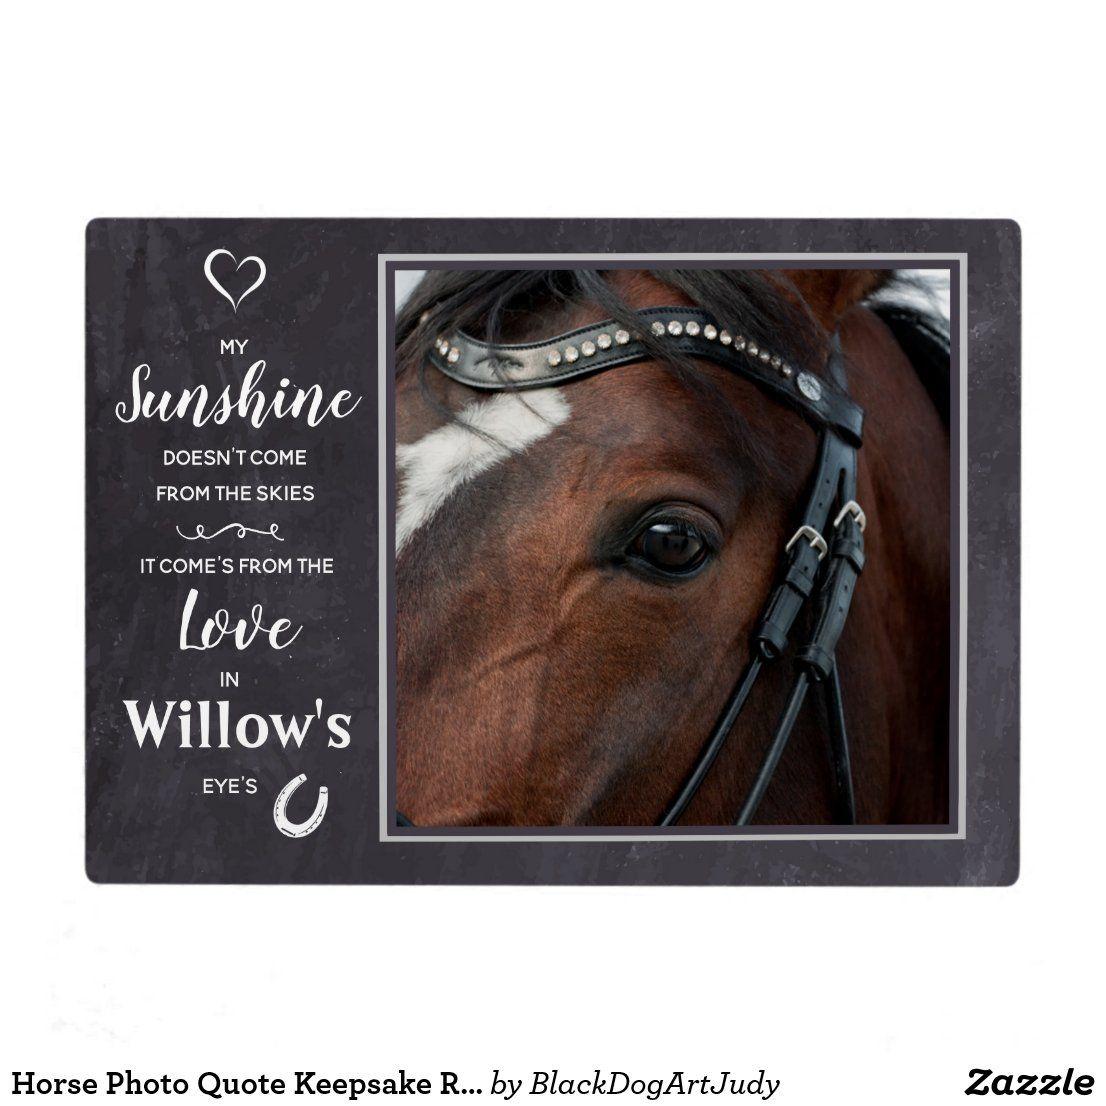 Horse Photo Quote Keepsake Rustic Horse Lover Plaque